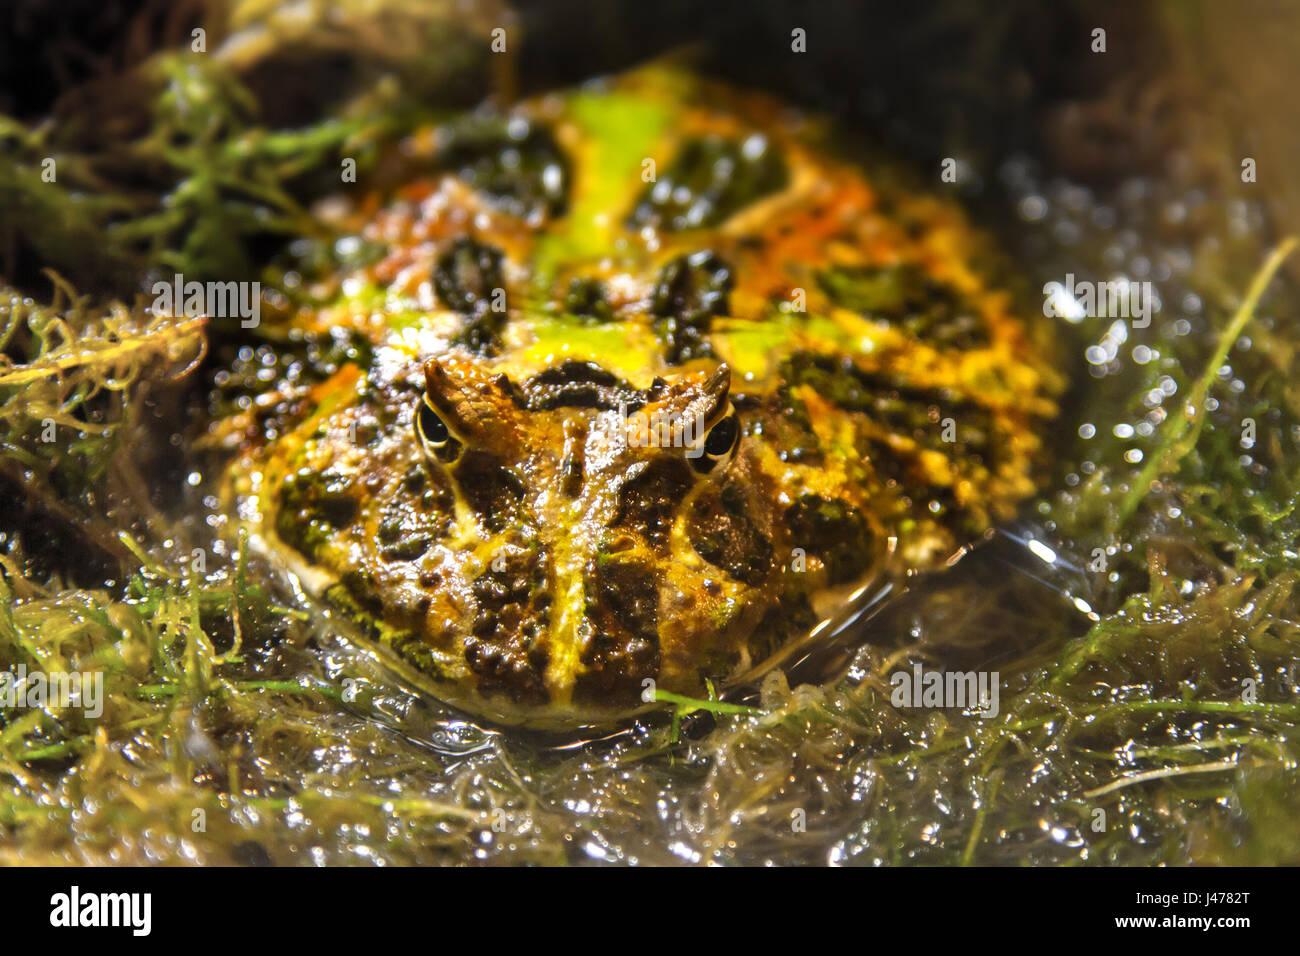 a Image exotic amphibians Brazilian horned toad - Stock Image